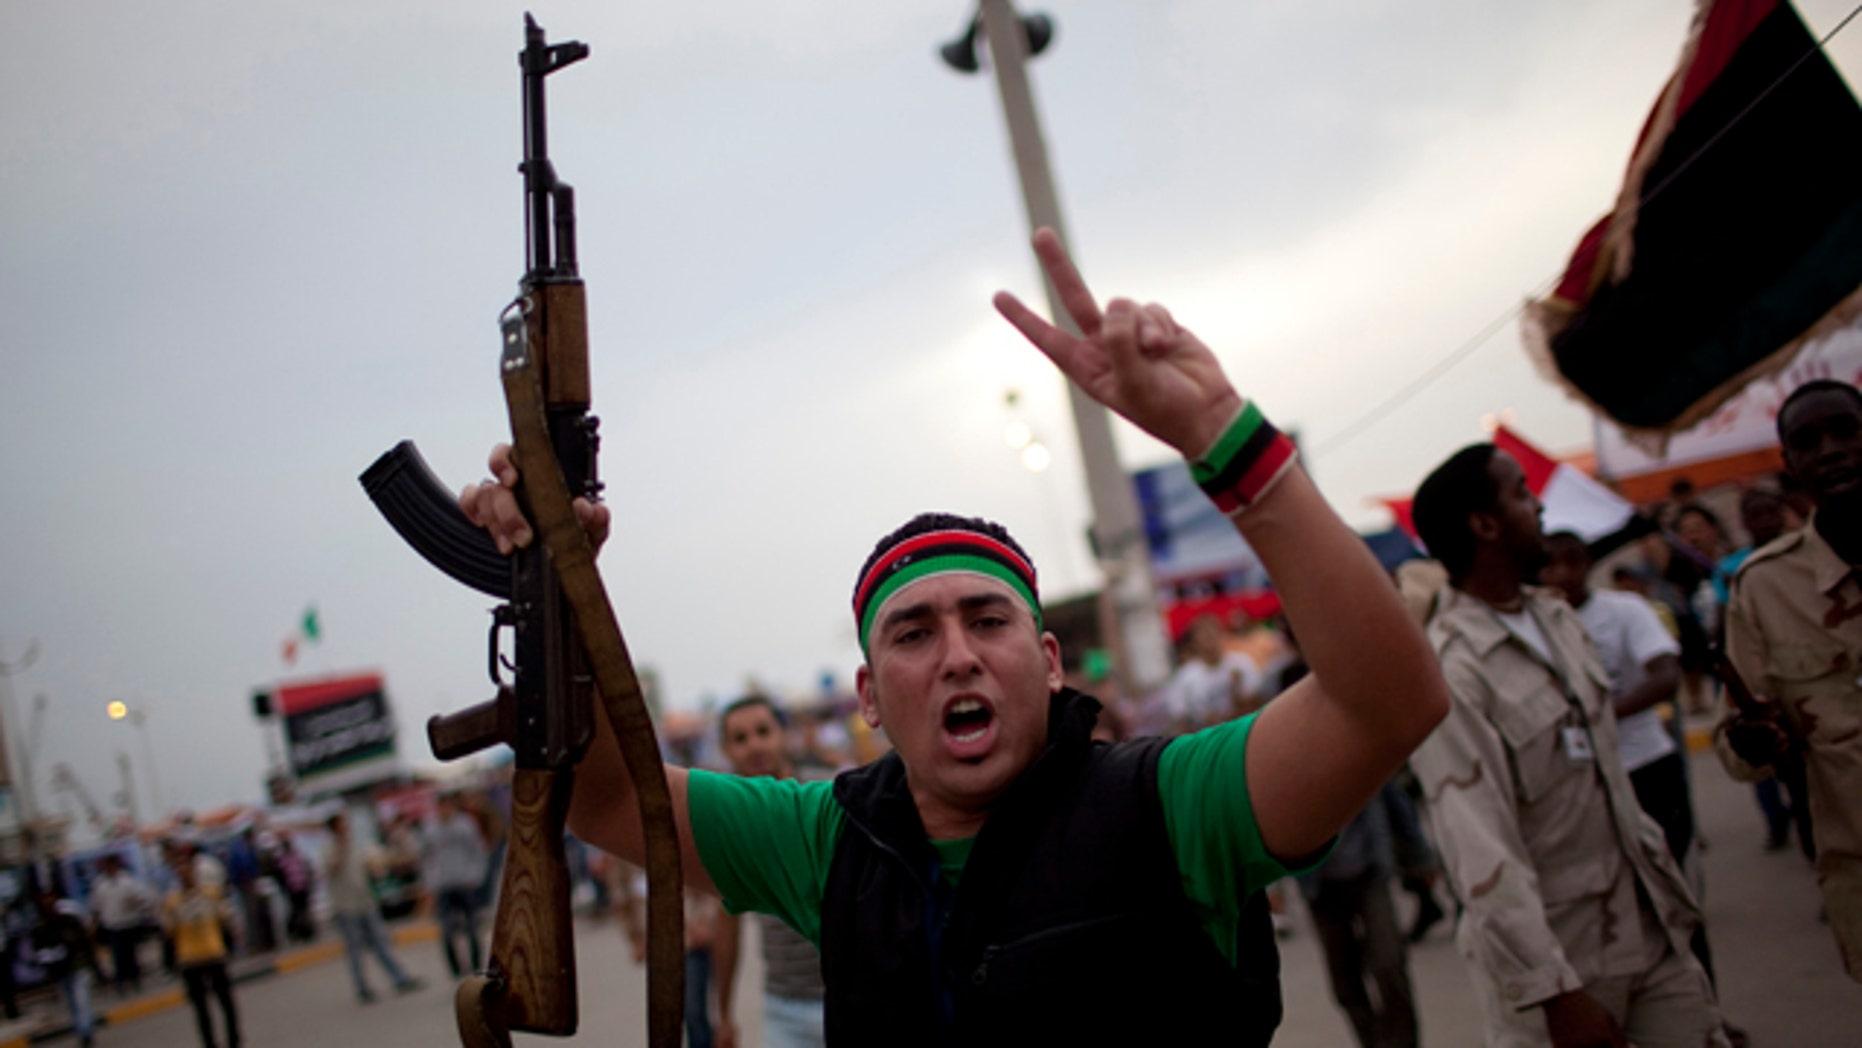 June 3: A man chants anti-Muammar al-Qaddafi slogans during a protest in the rebel strong hold of Benghazi, Libya.